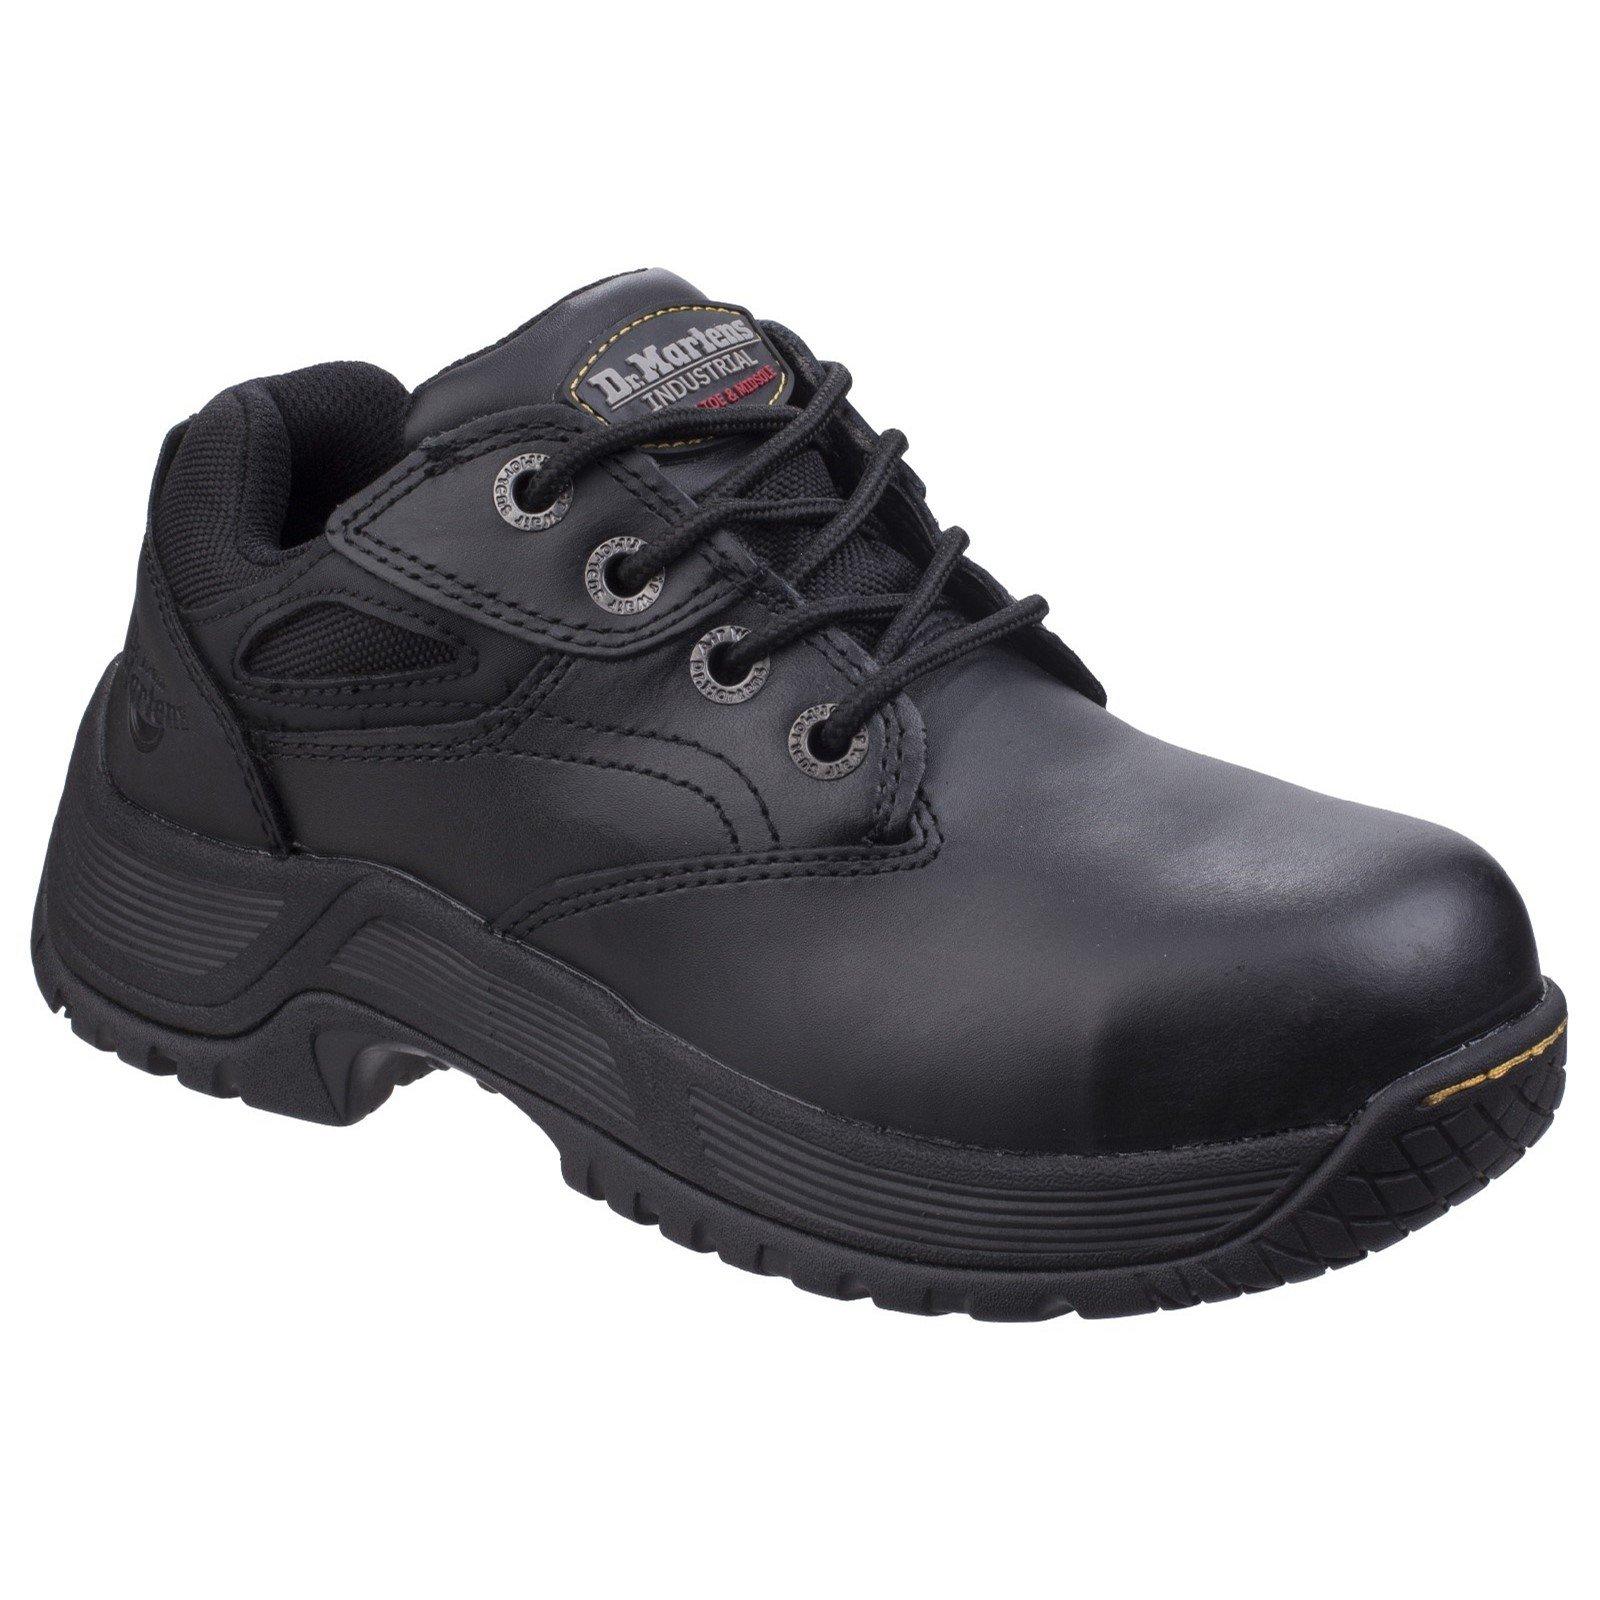 Dr Martens Unisex Calvert Steel Toe Safety Trainer Black 26022 - Black 3